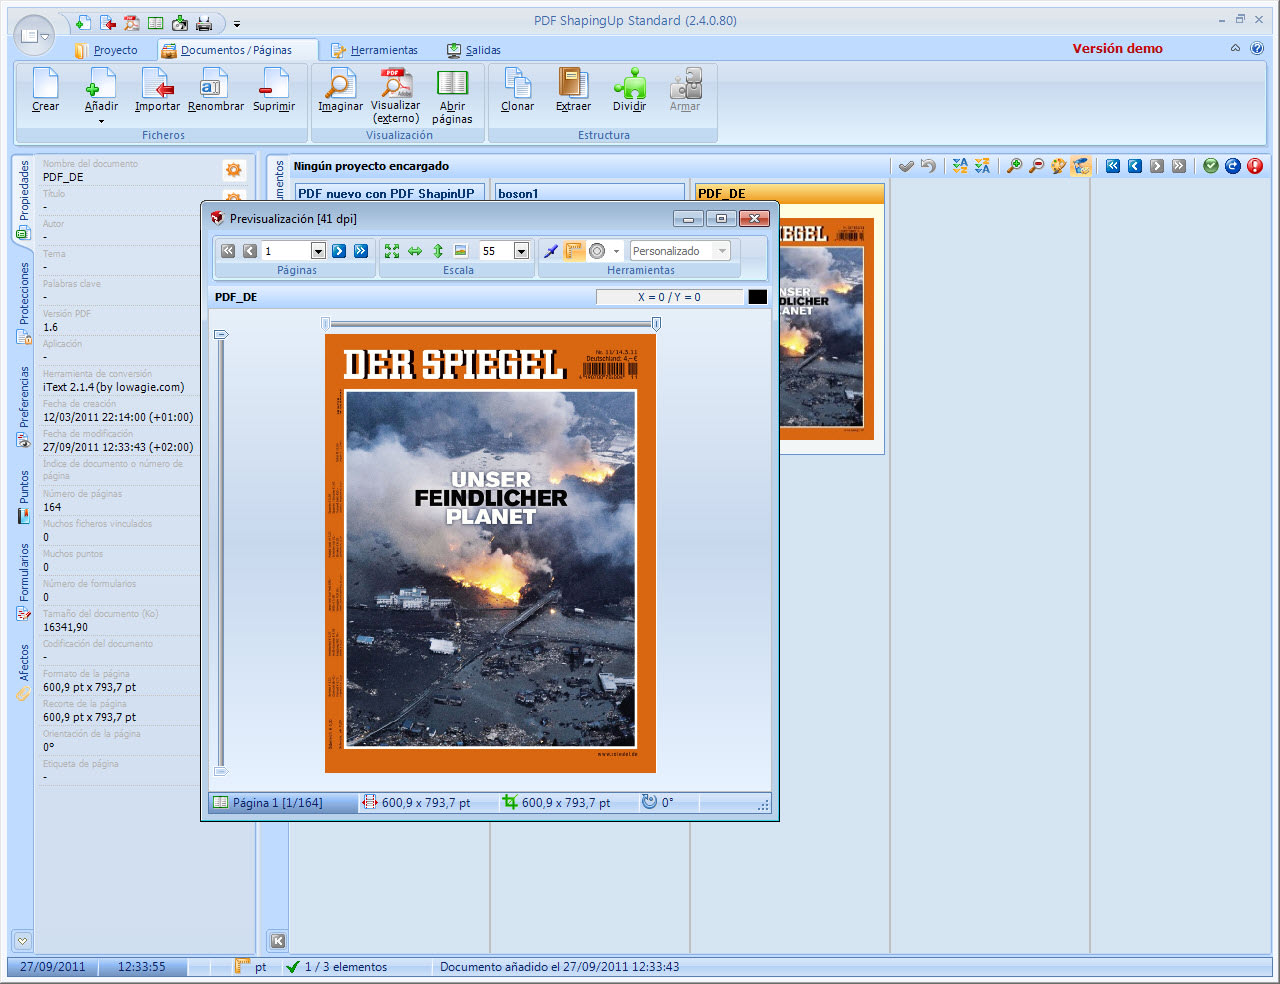 PDF ShapingUp